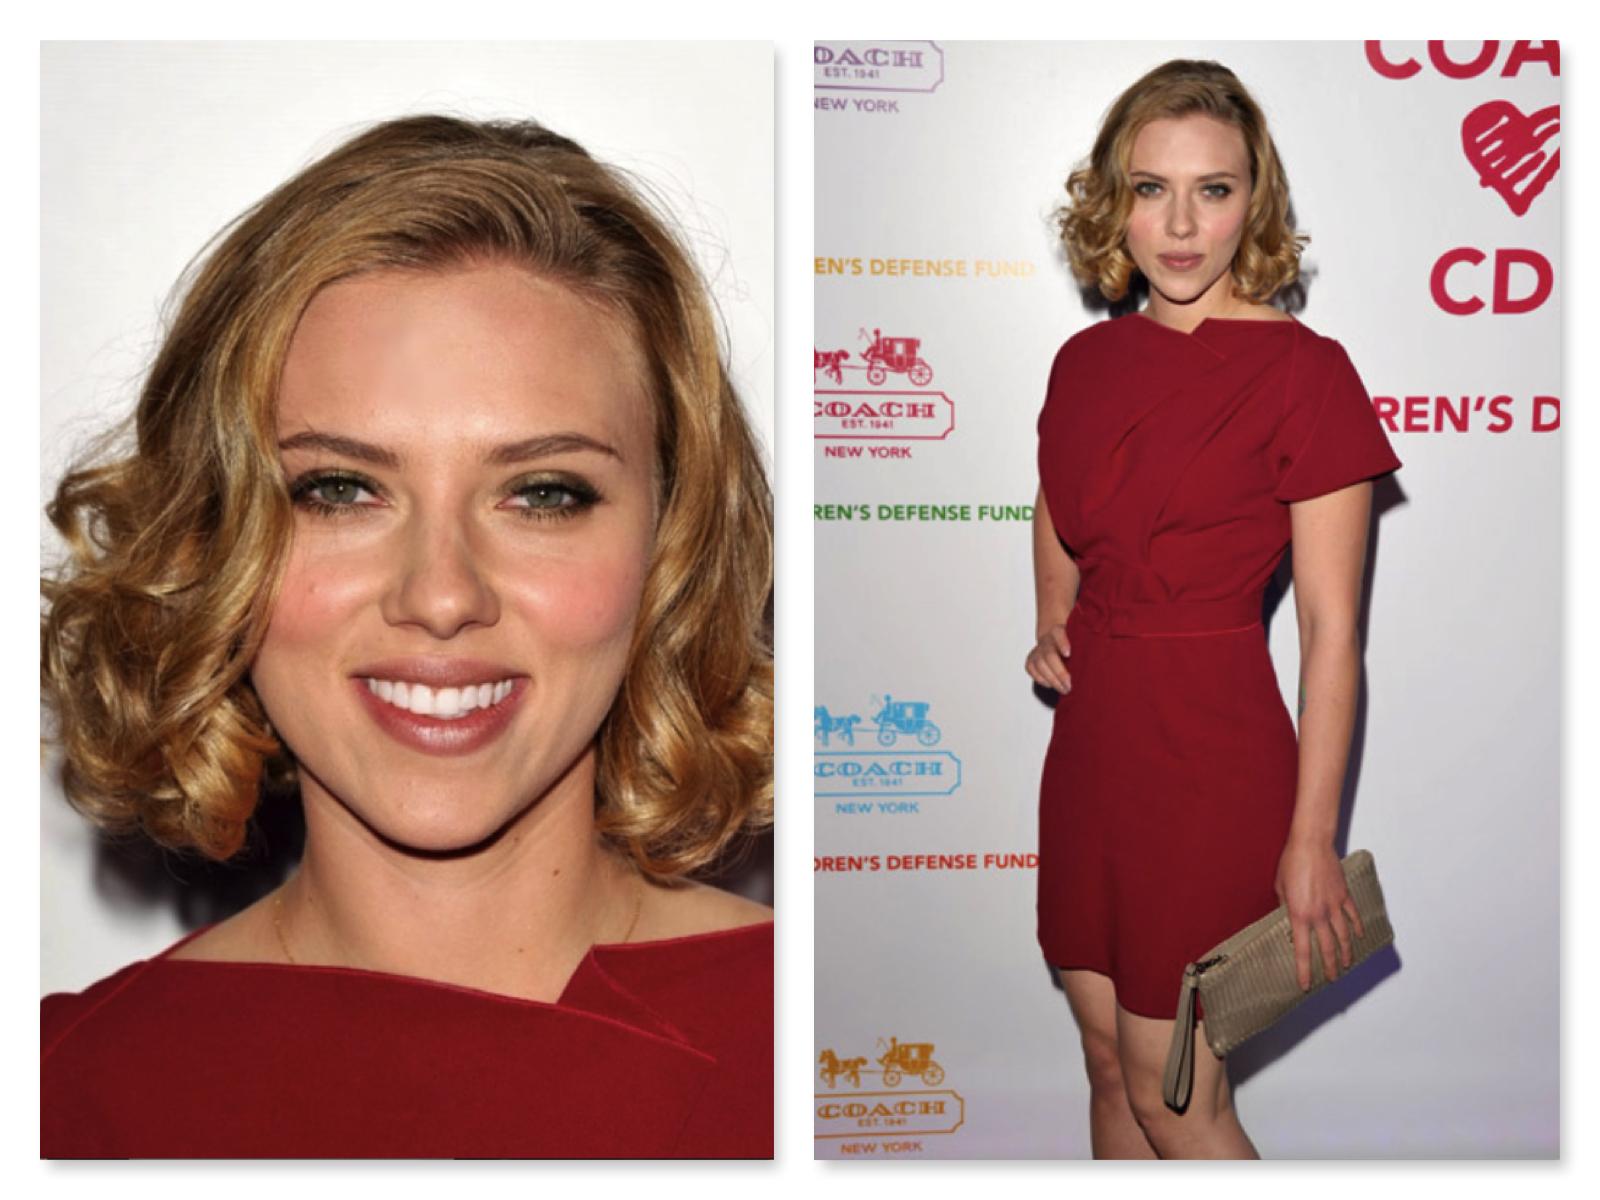 Scarlett Johansson/Event for COACH